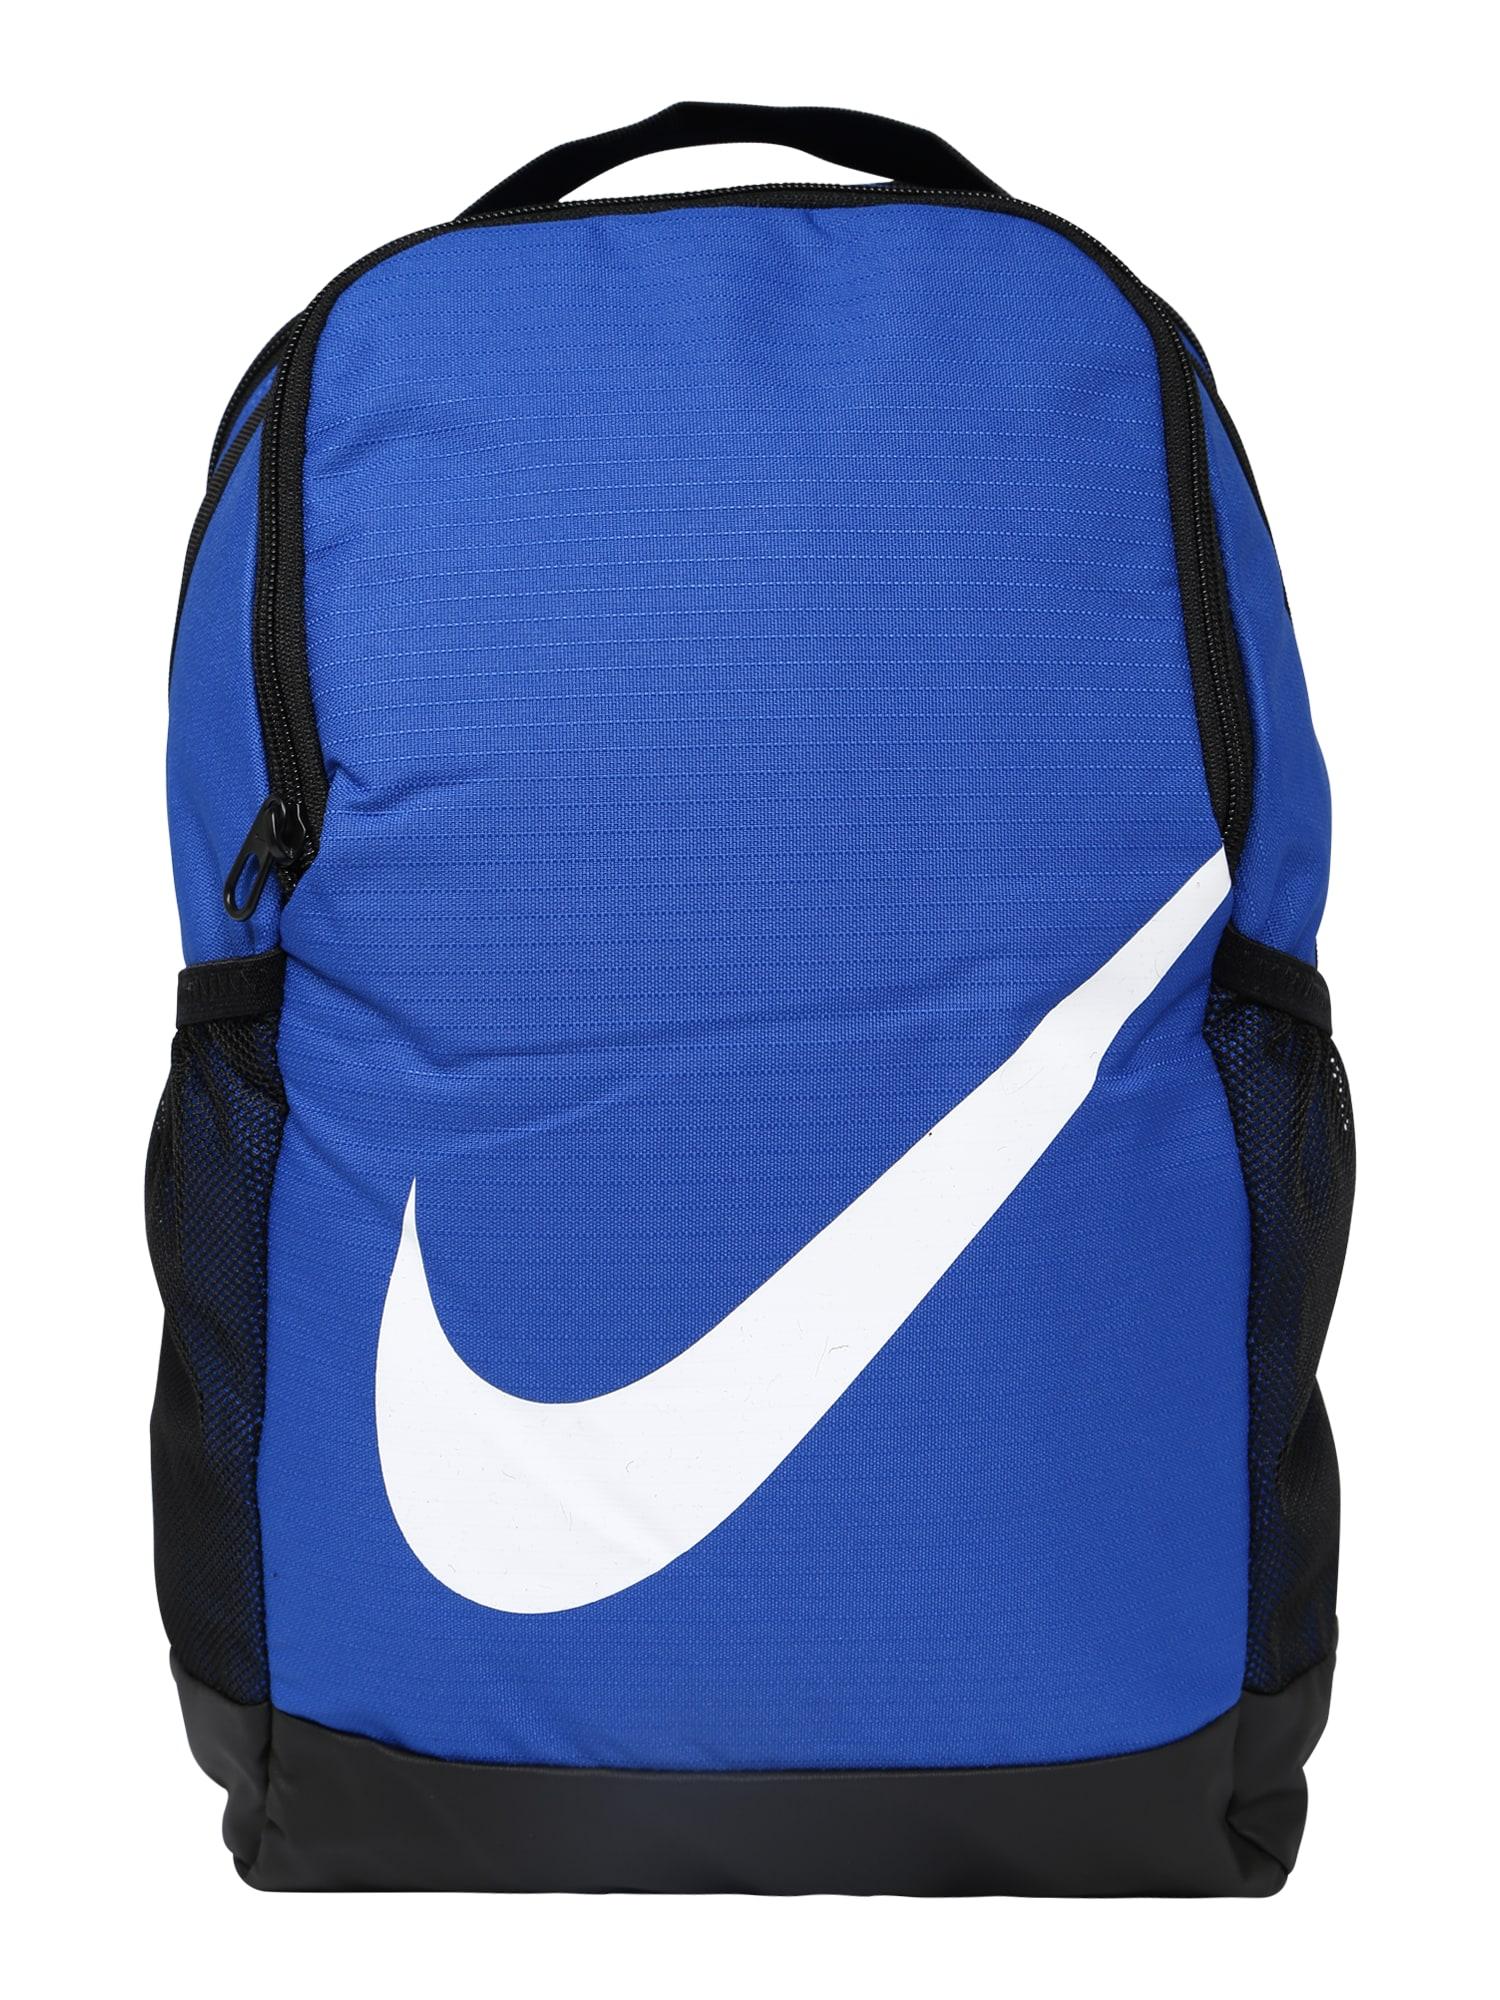 Batoh modrá černá Nike Sportswear